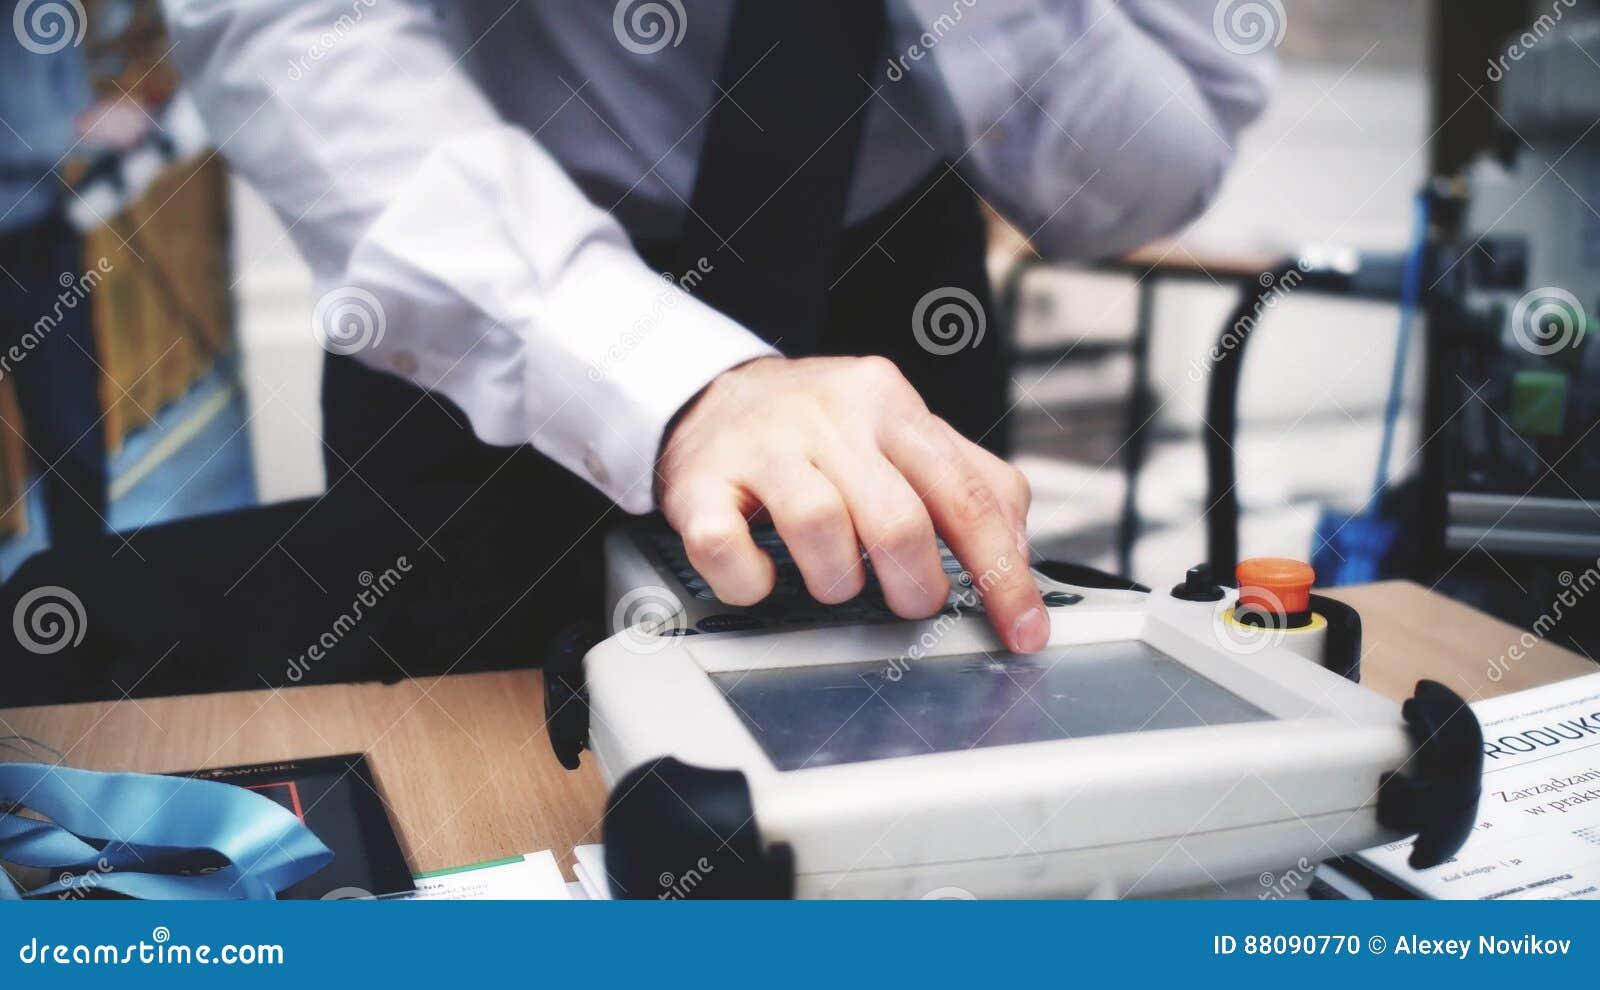 Robotics Engineer Uses Industrial Touchscreen Computer Stock Photo